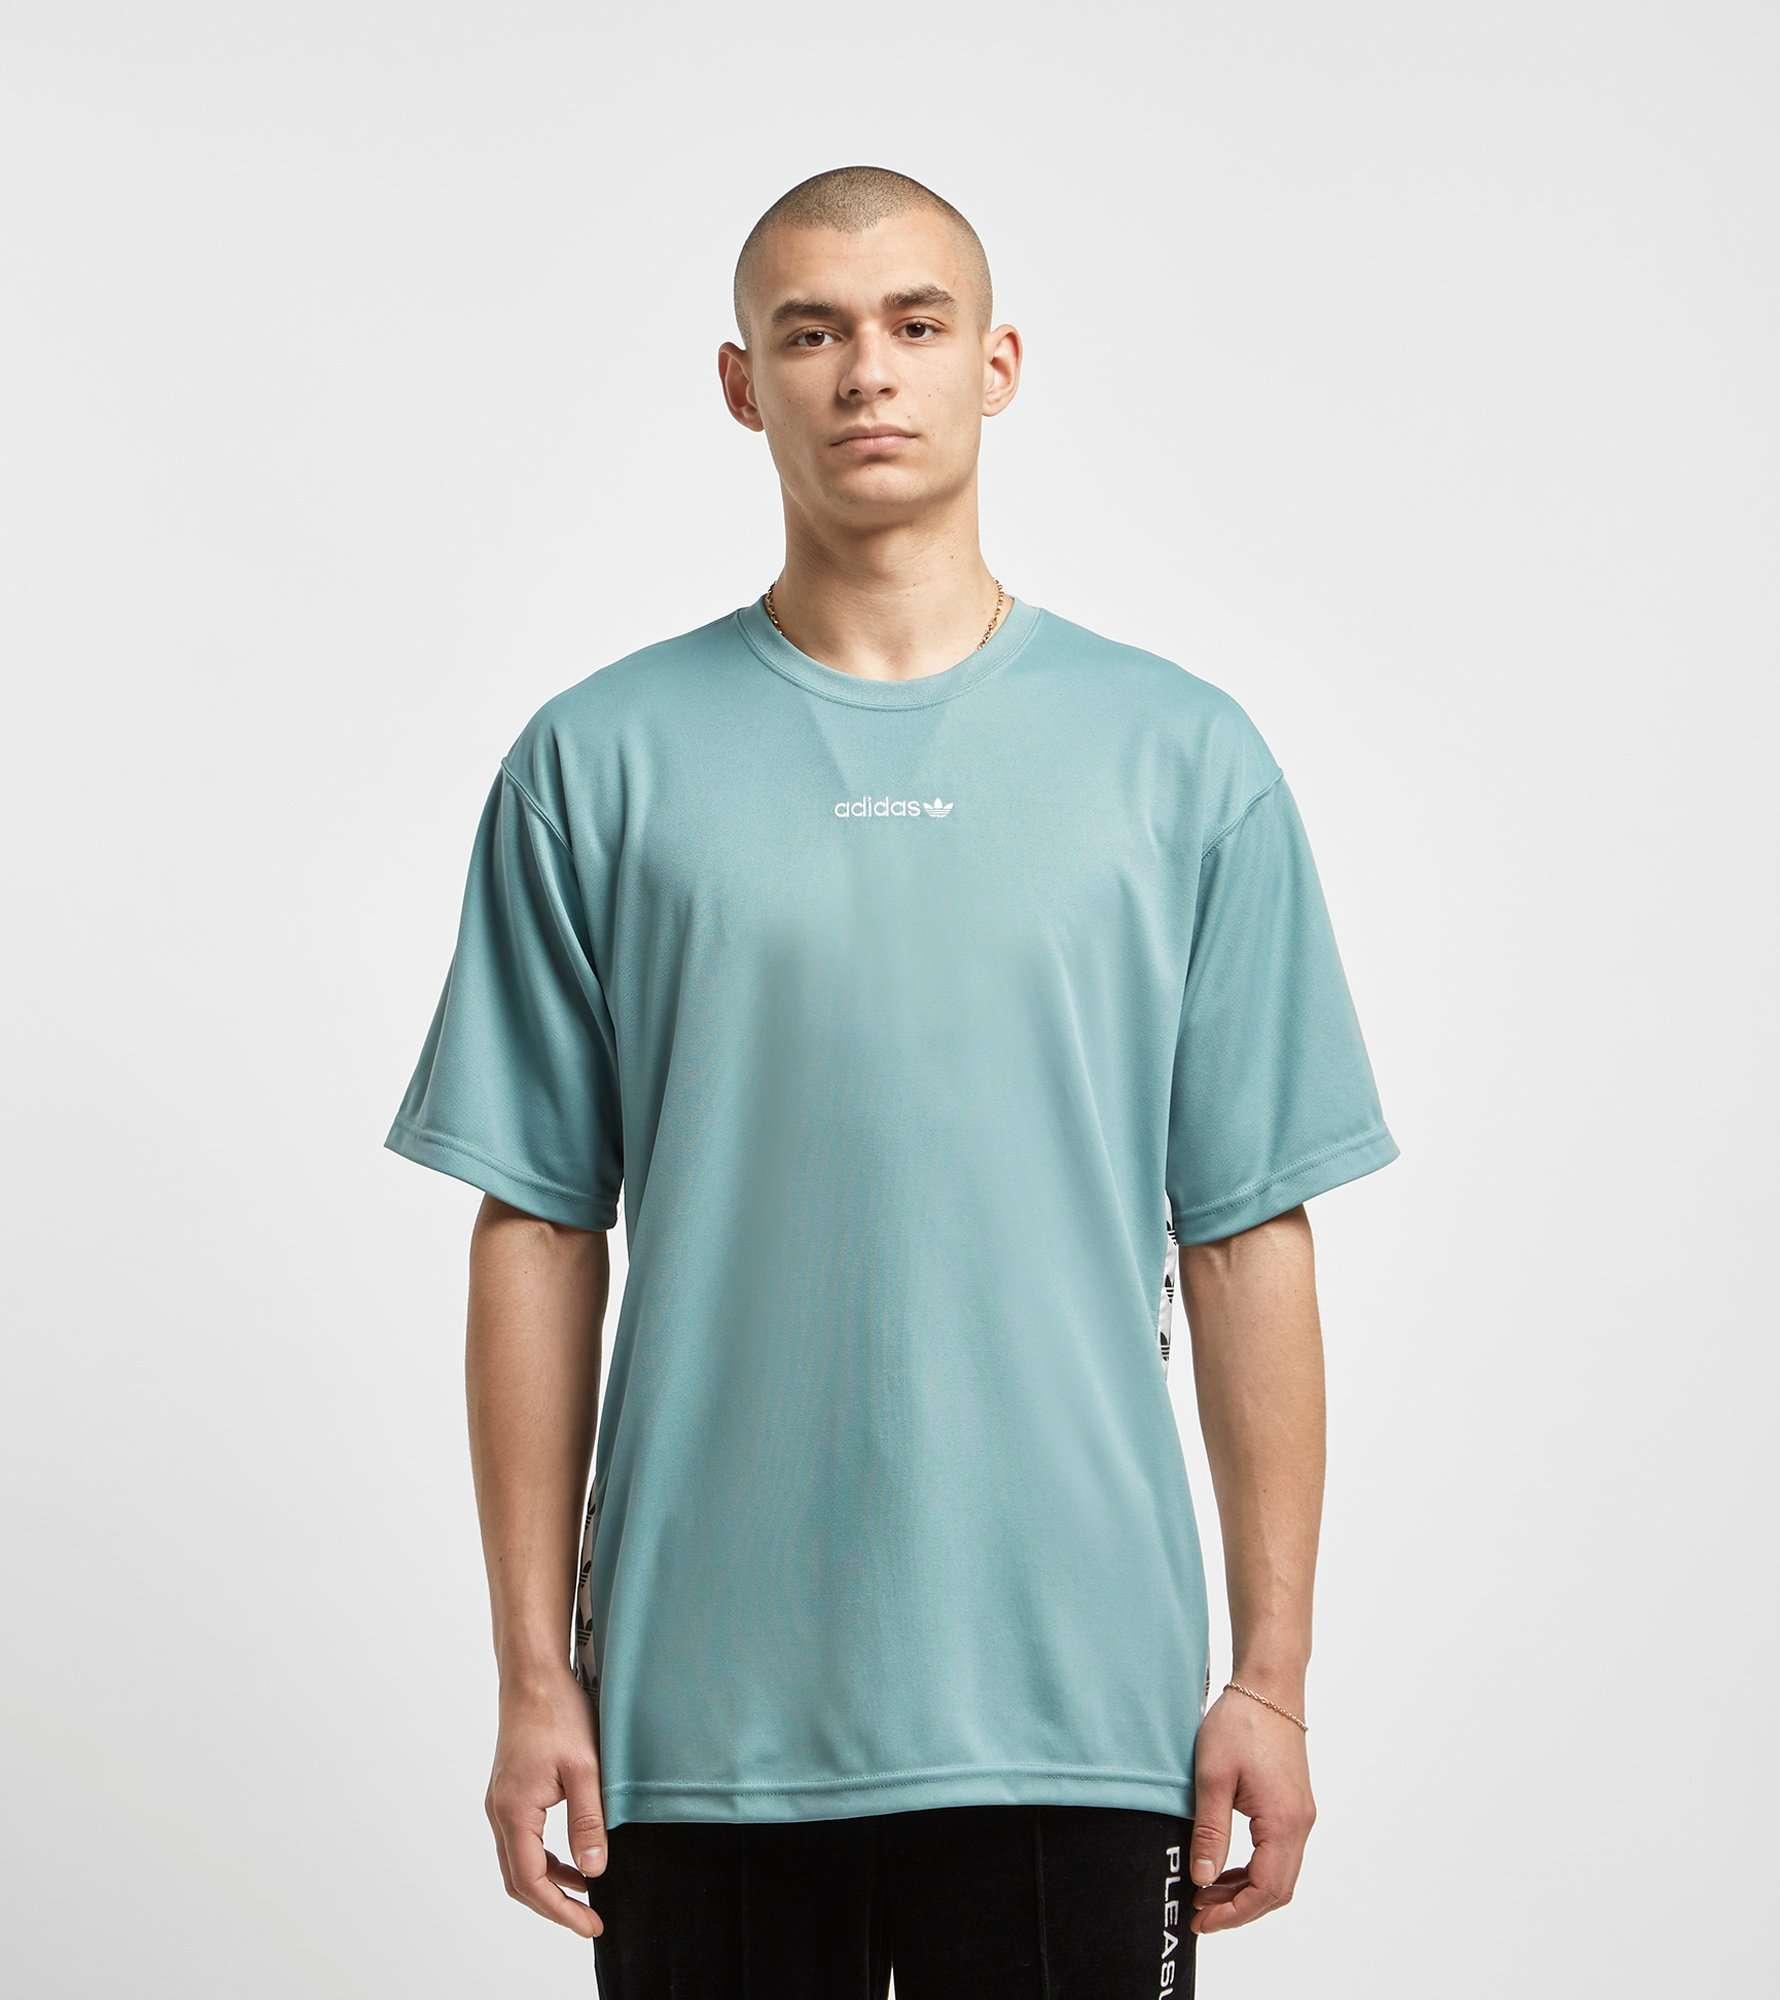 adidas Originals Tape T Shirt | Size?